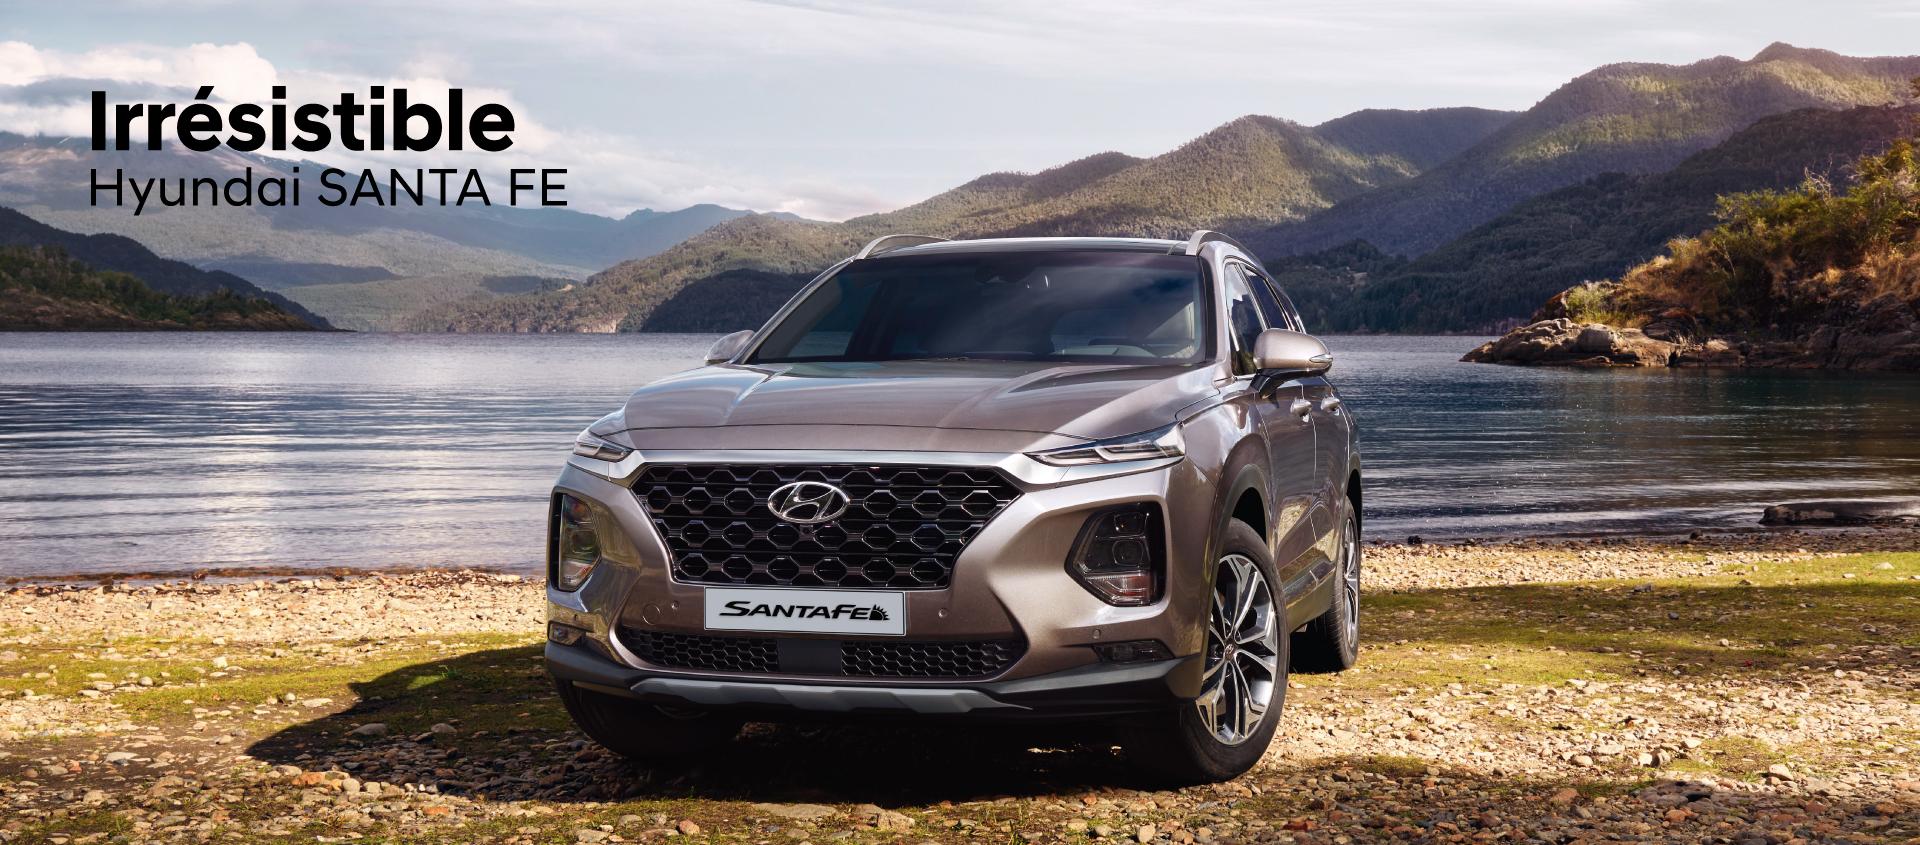 L'Irrésistible Hyundai Santa Fe